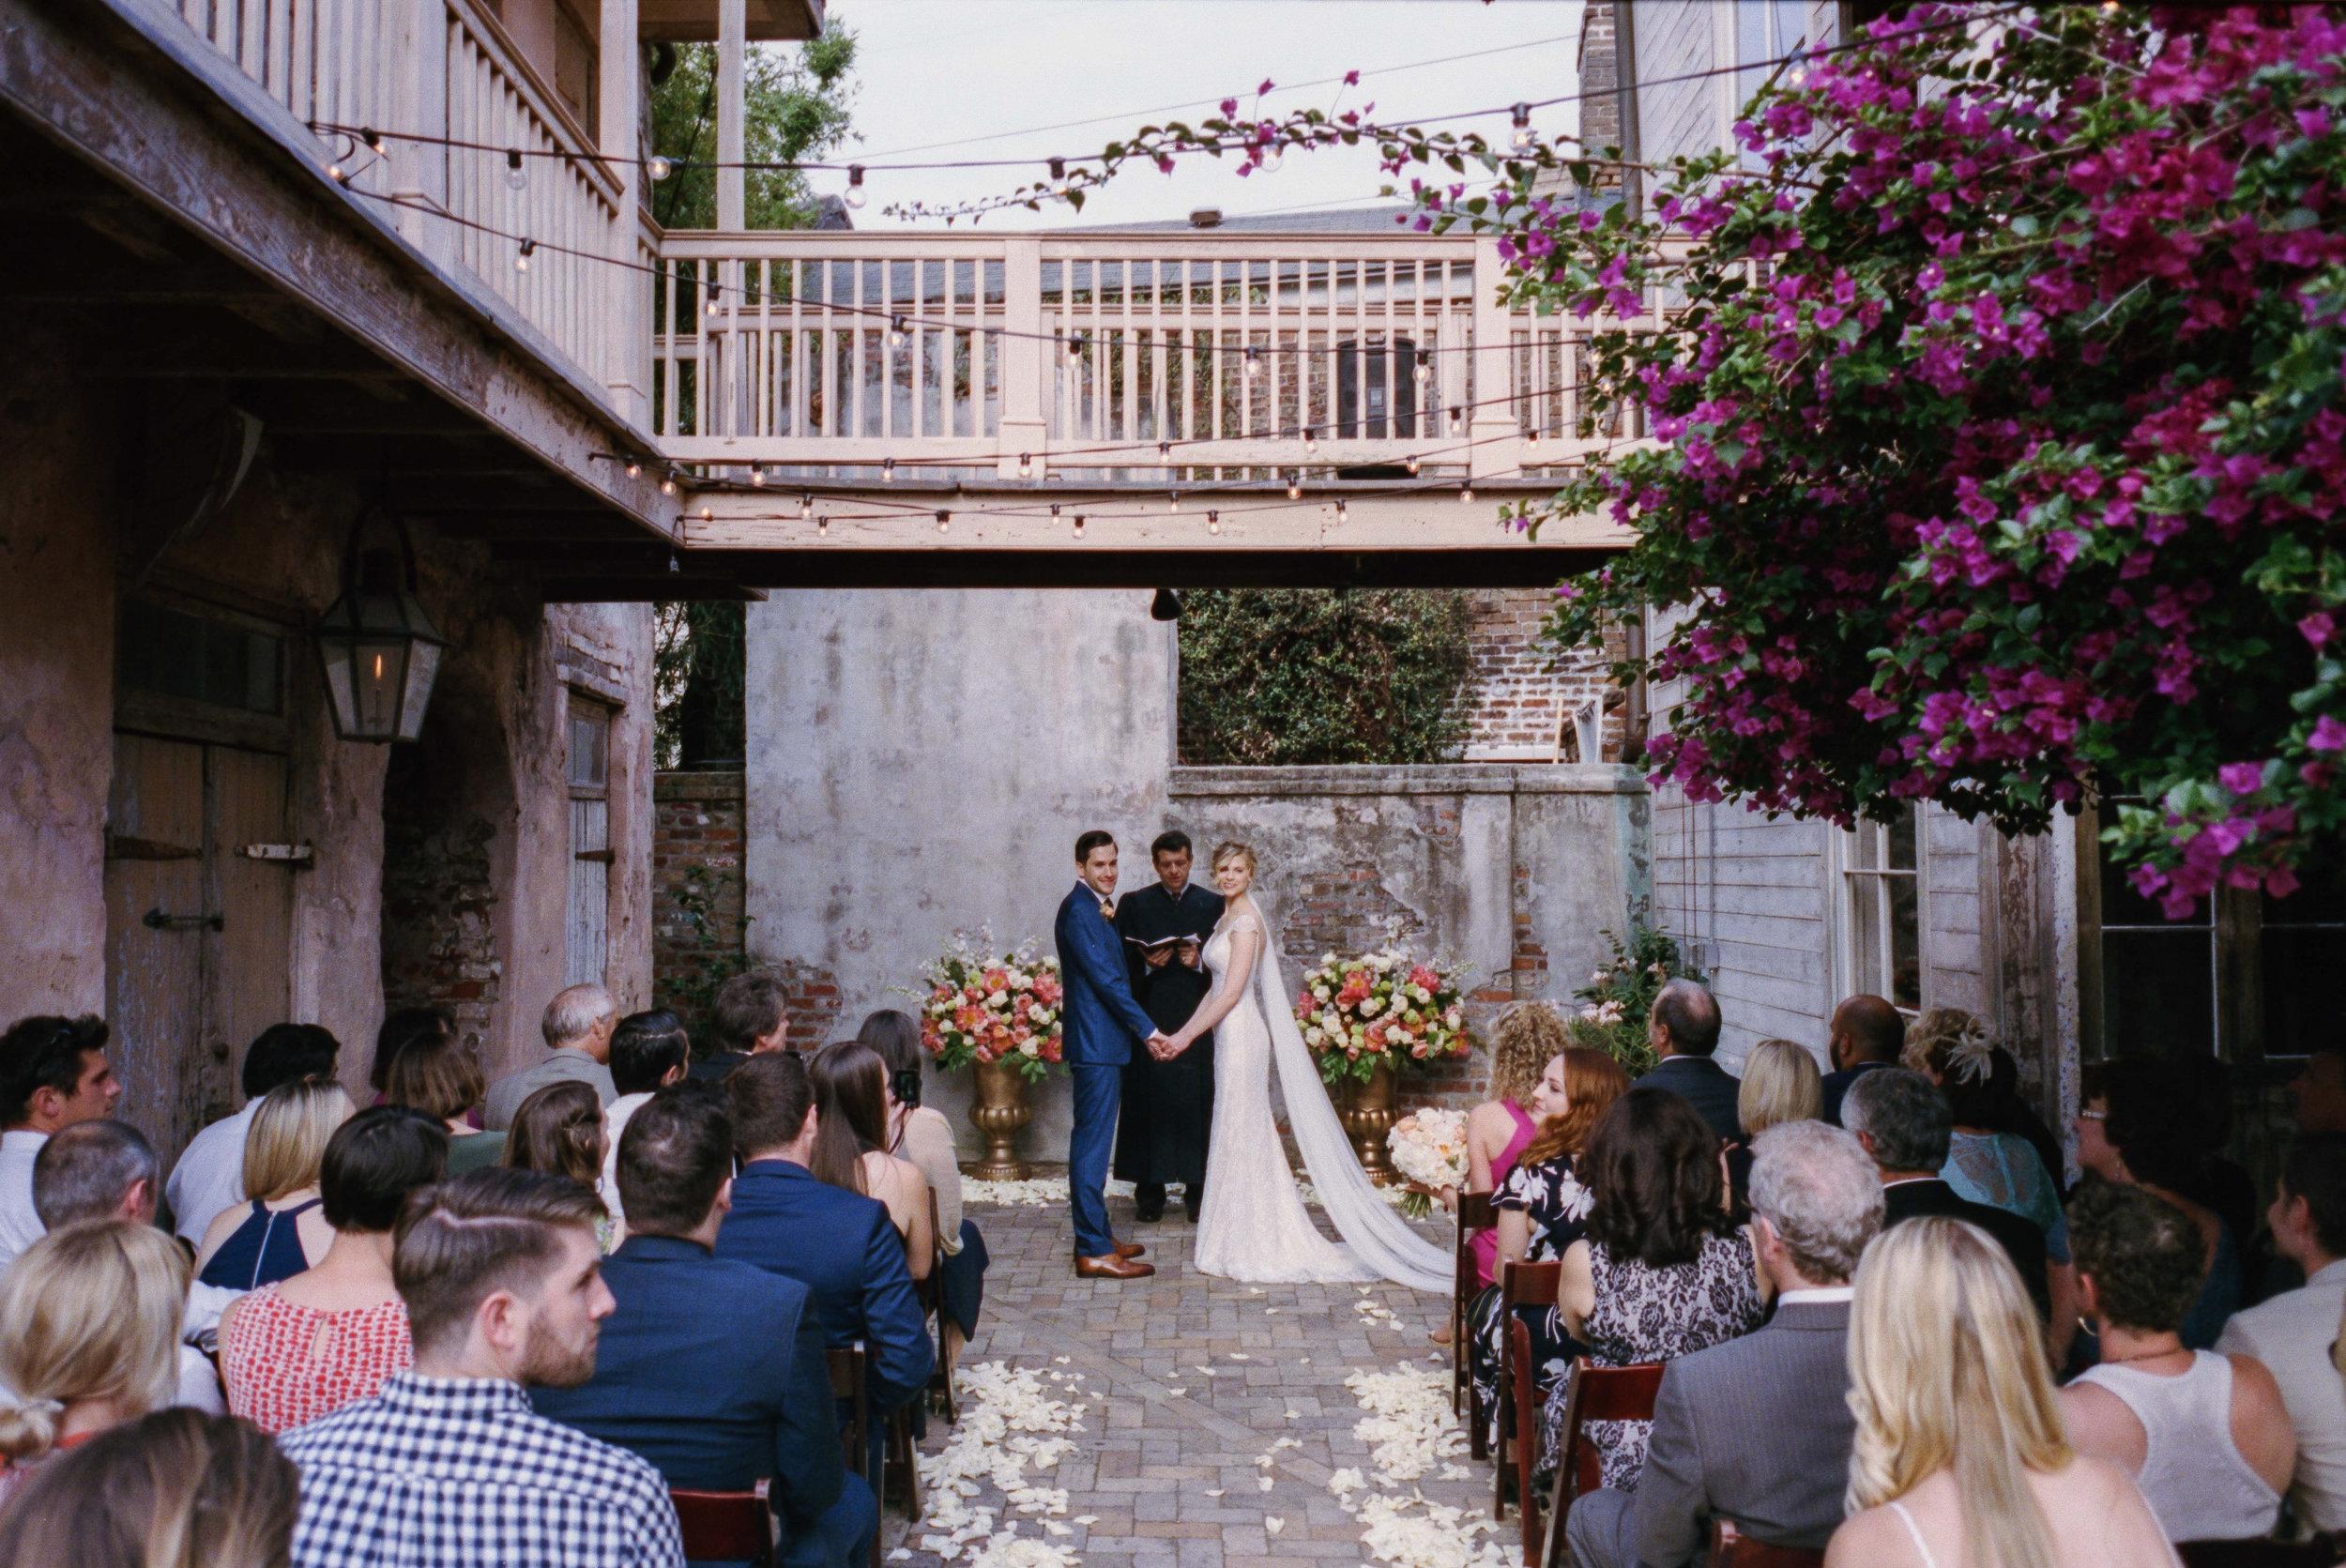 portra_400_film_wedding_chellise_michael_photography-19.jpg